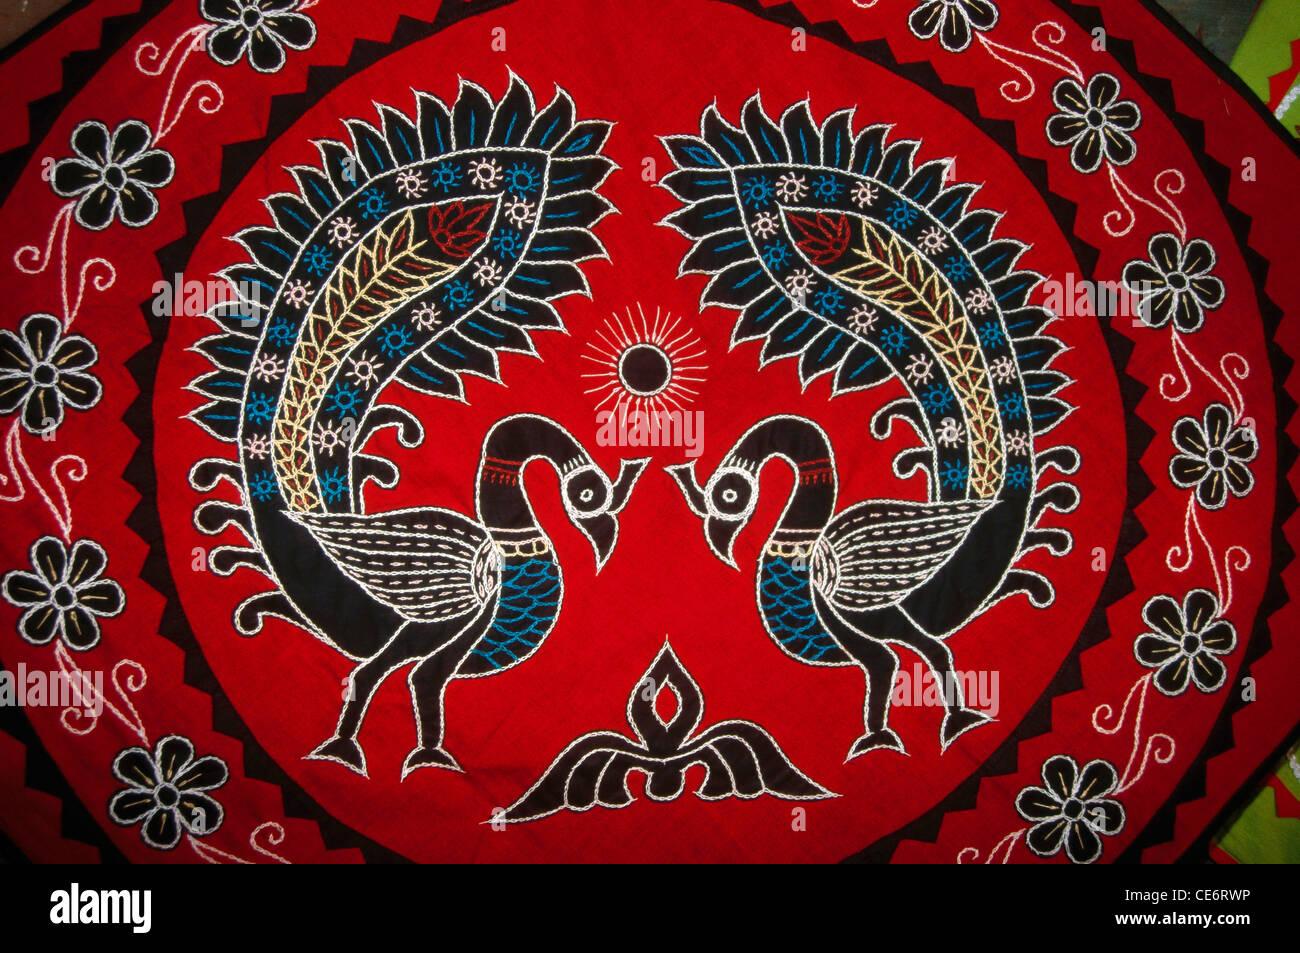 Dba 85042 : pipli appliqué two dancing peacocks traditional folk art